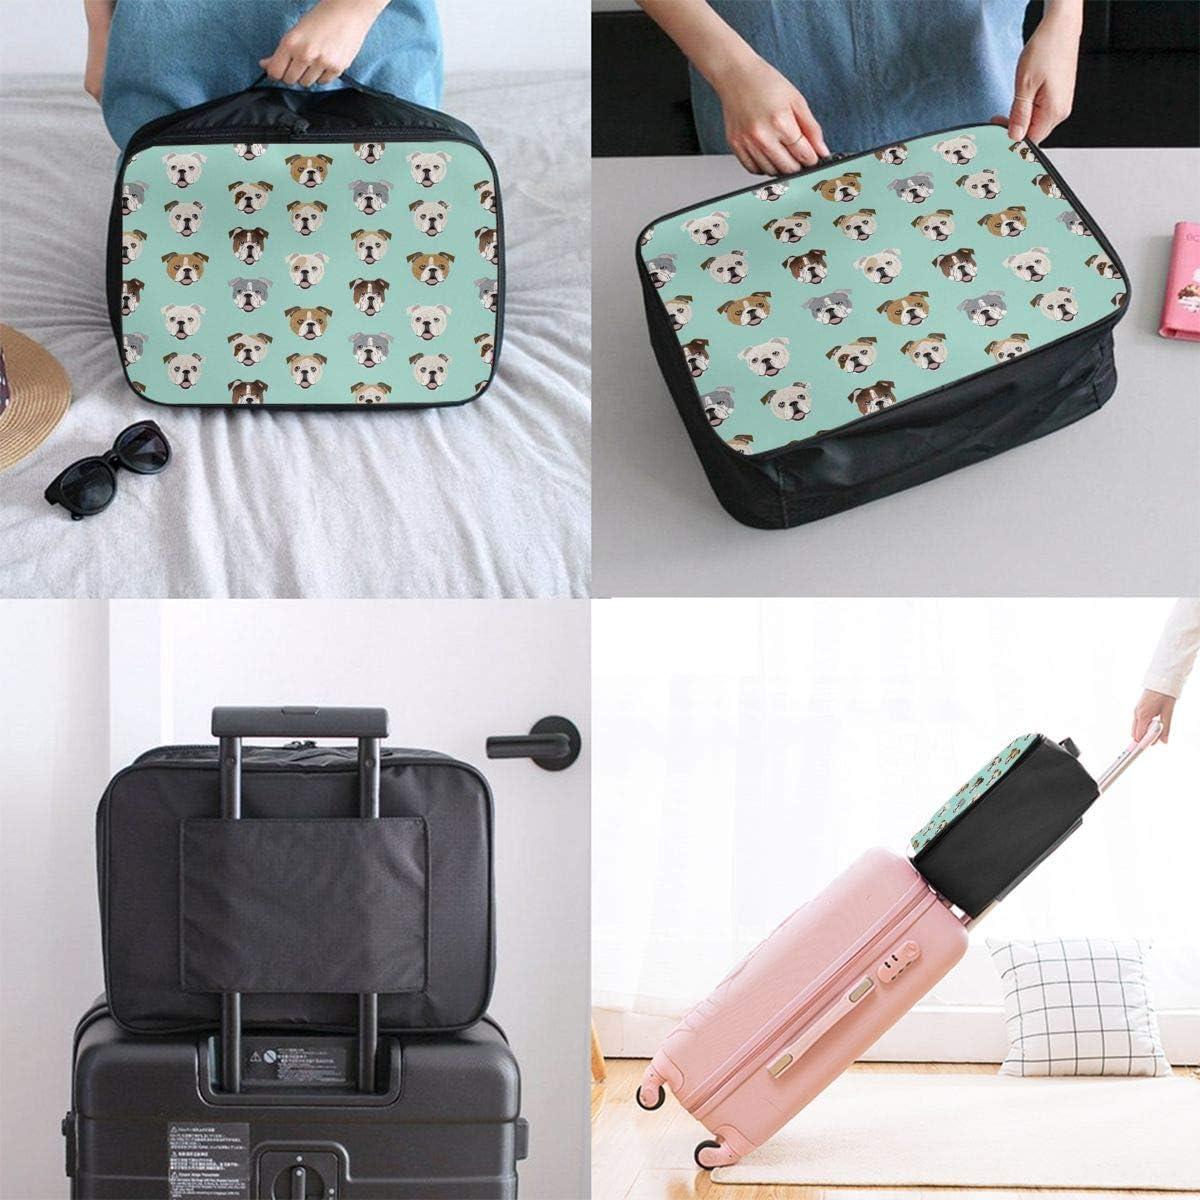 English Bulldog Dog Face Mint Green Travel Duffel Bag Waterproof Fashion Lightweight Large Capacity Portable Luggage Bag